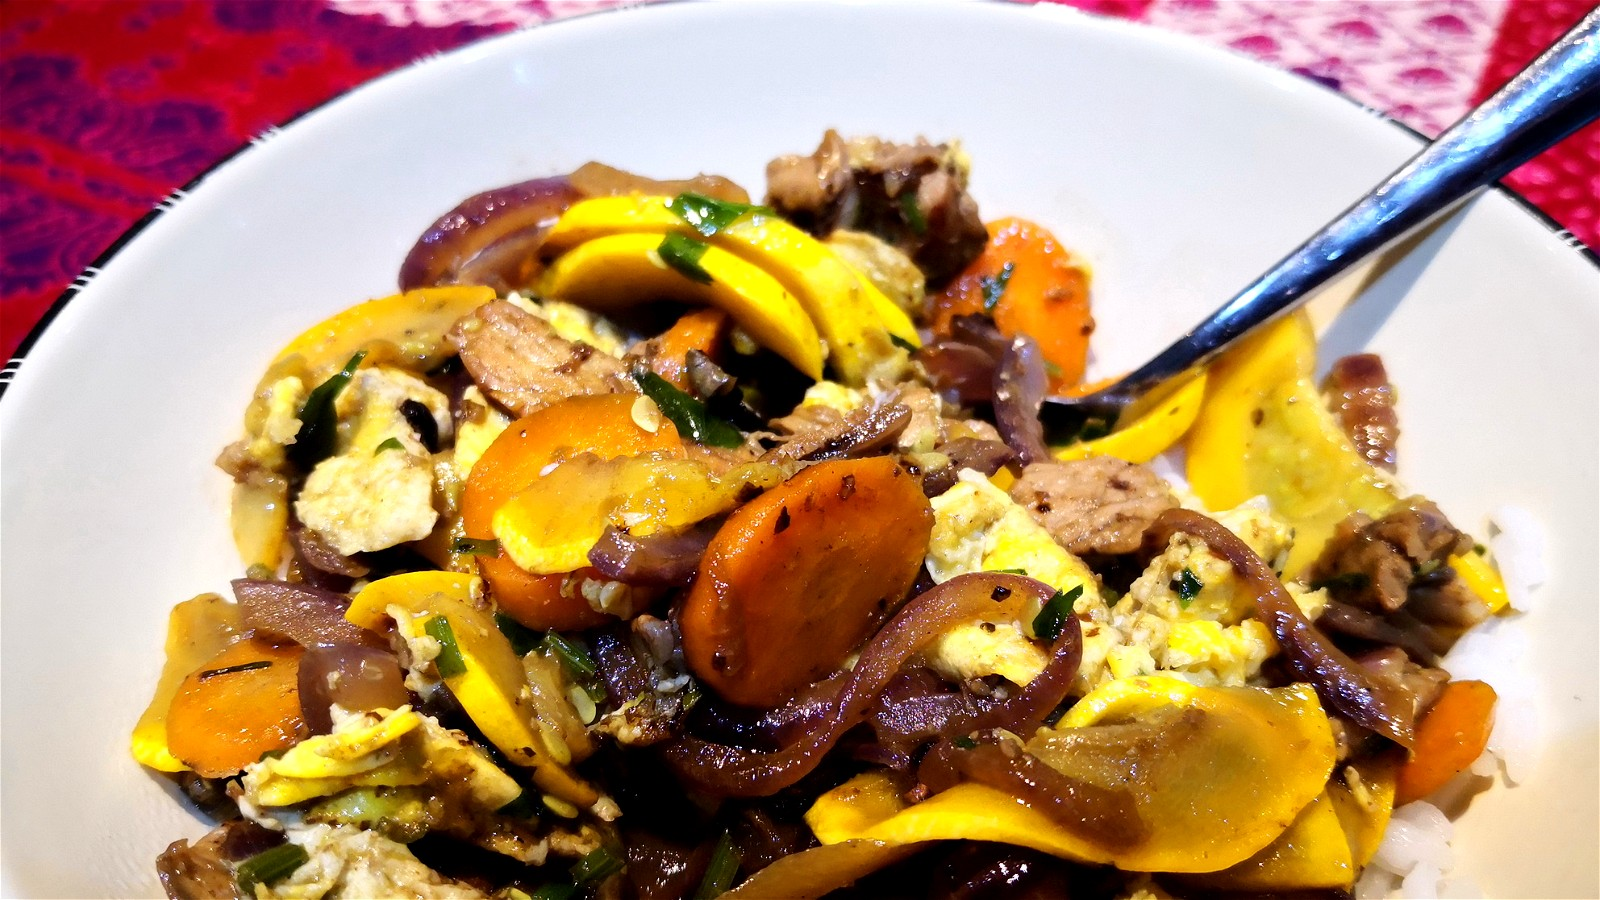 Image of Vegetable Stir Fry with Black Garlic Puree